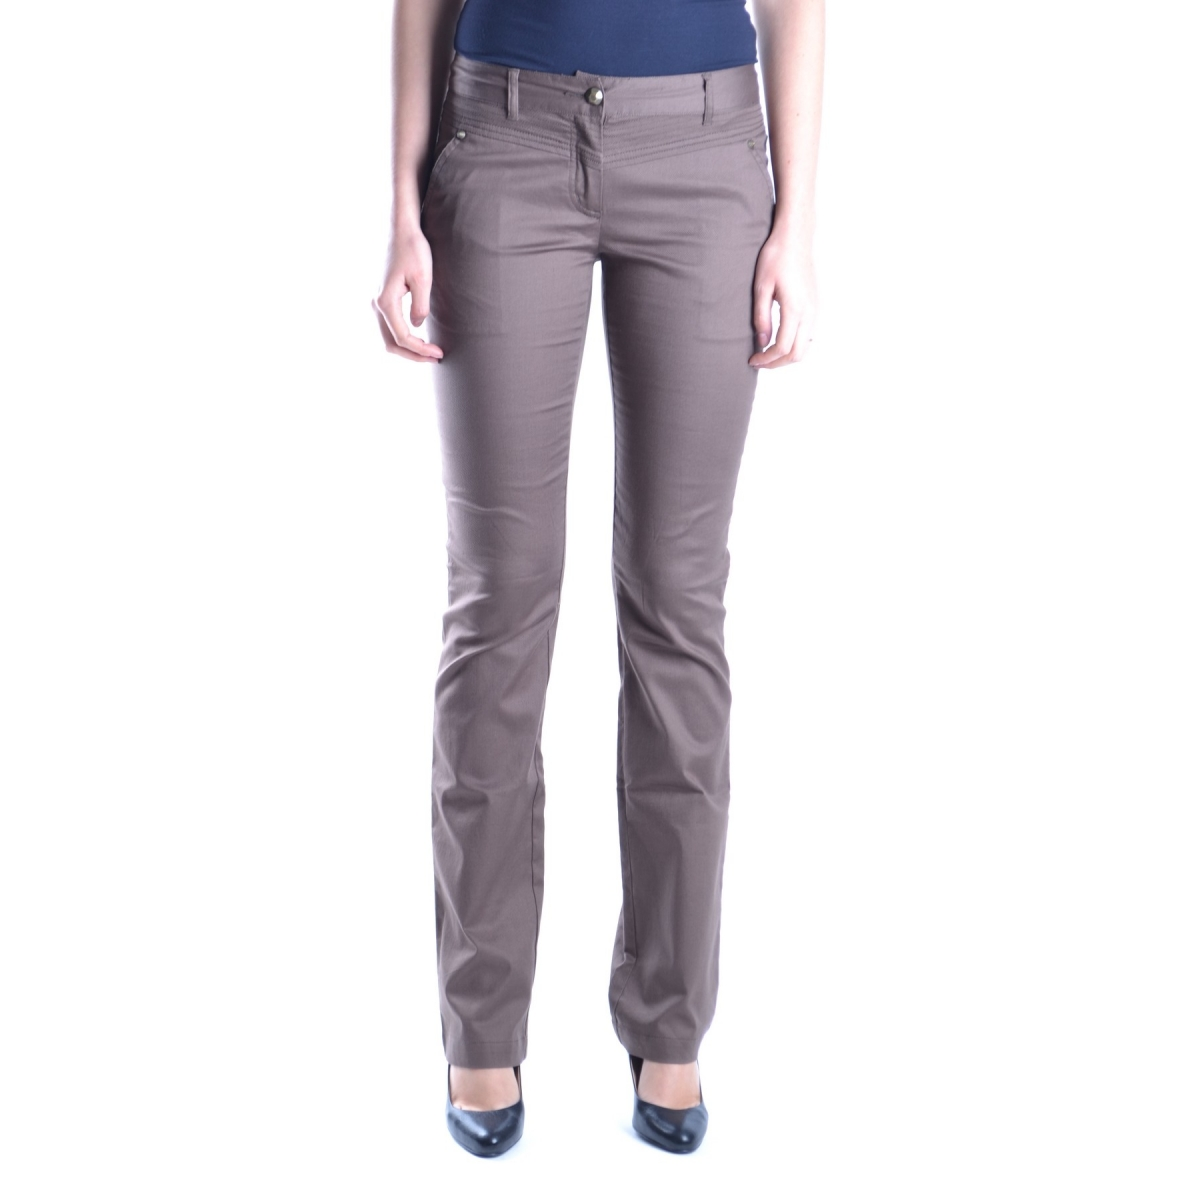 Class cavalli pantaloni trousers Egm352 12193IT -70%